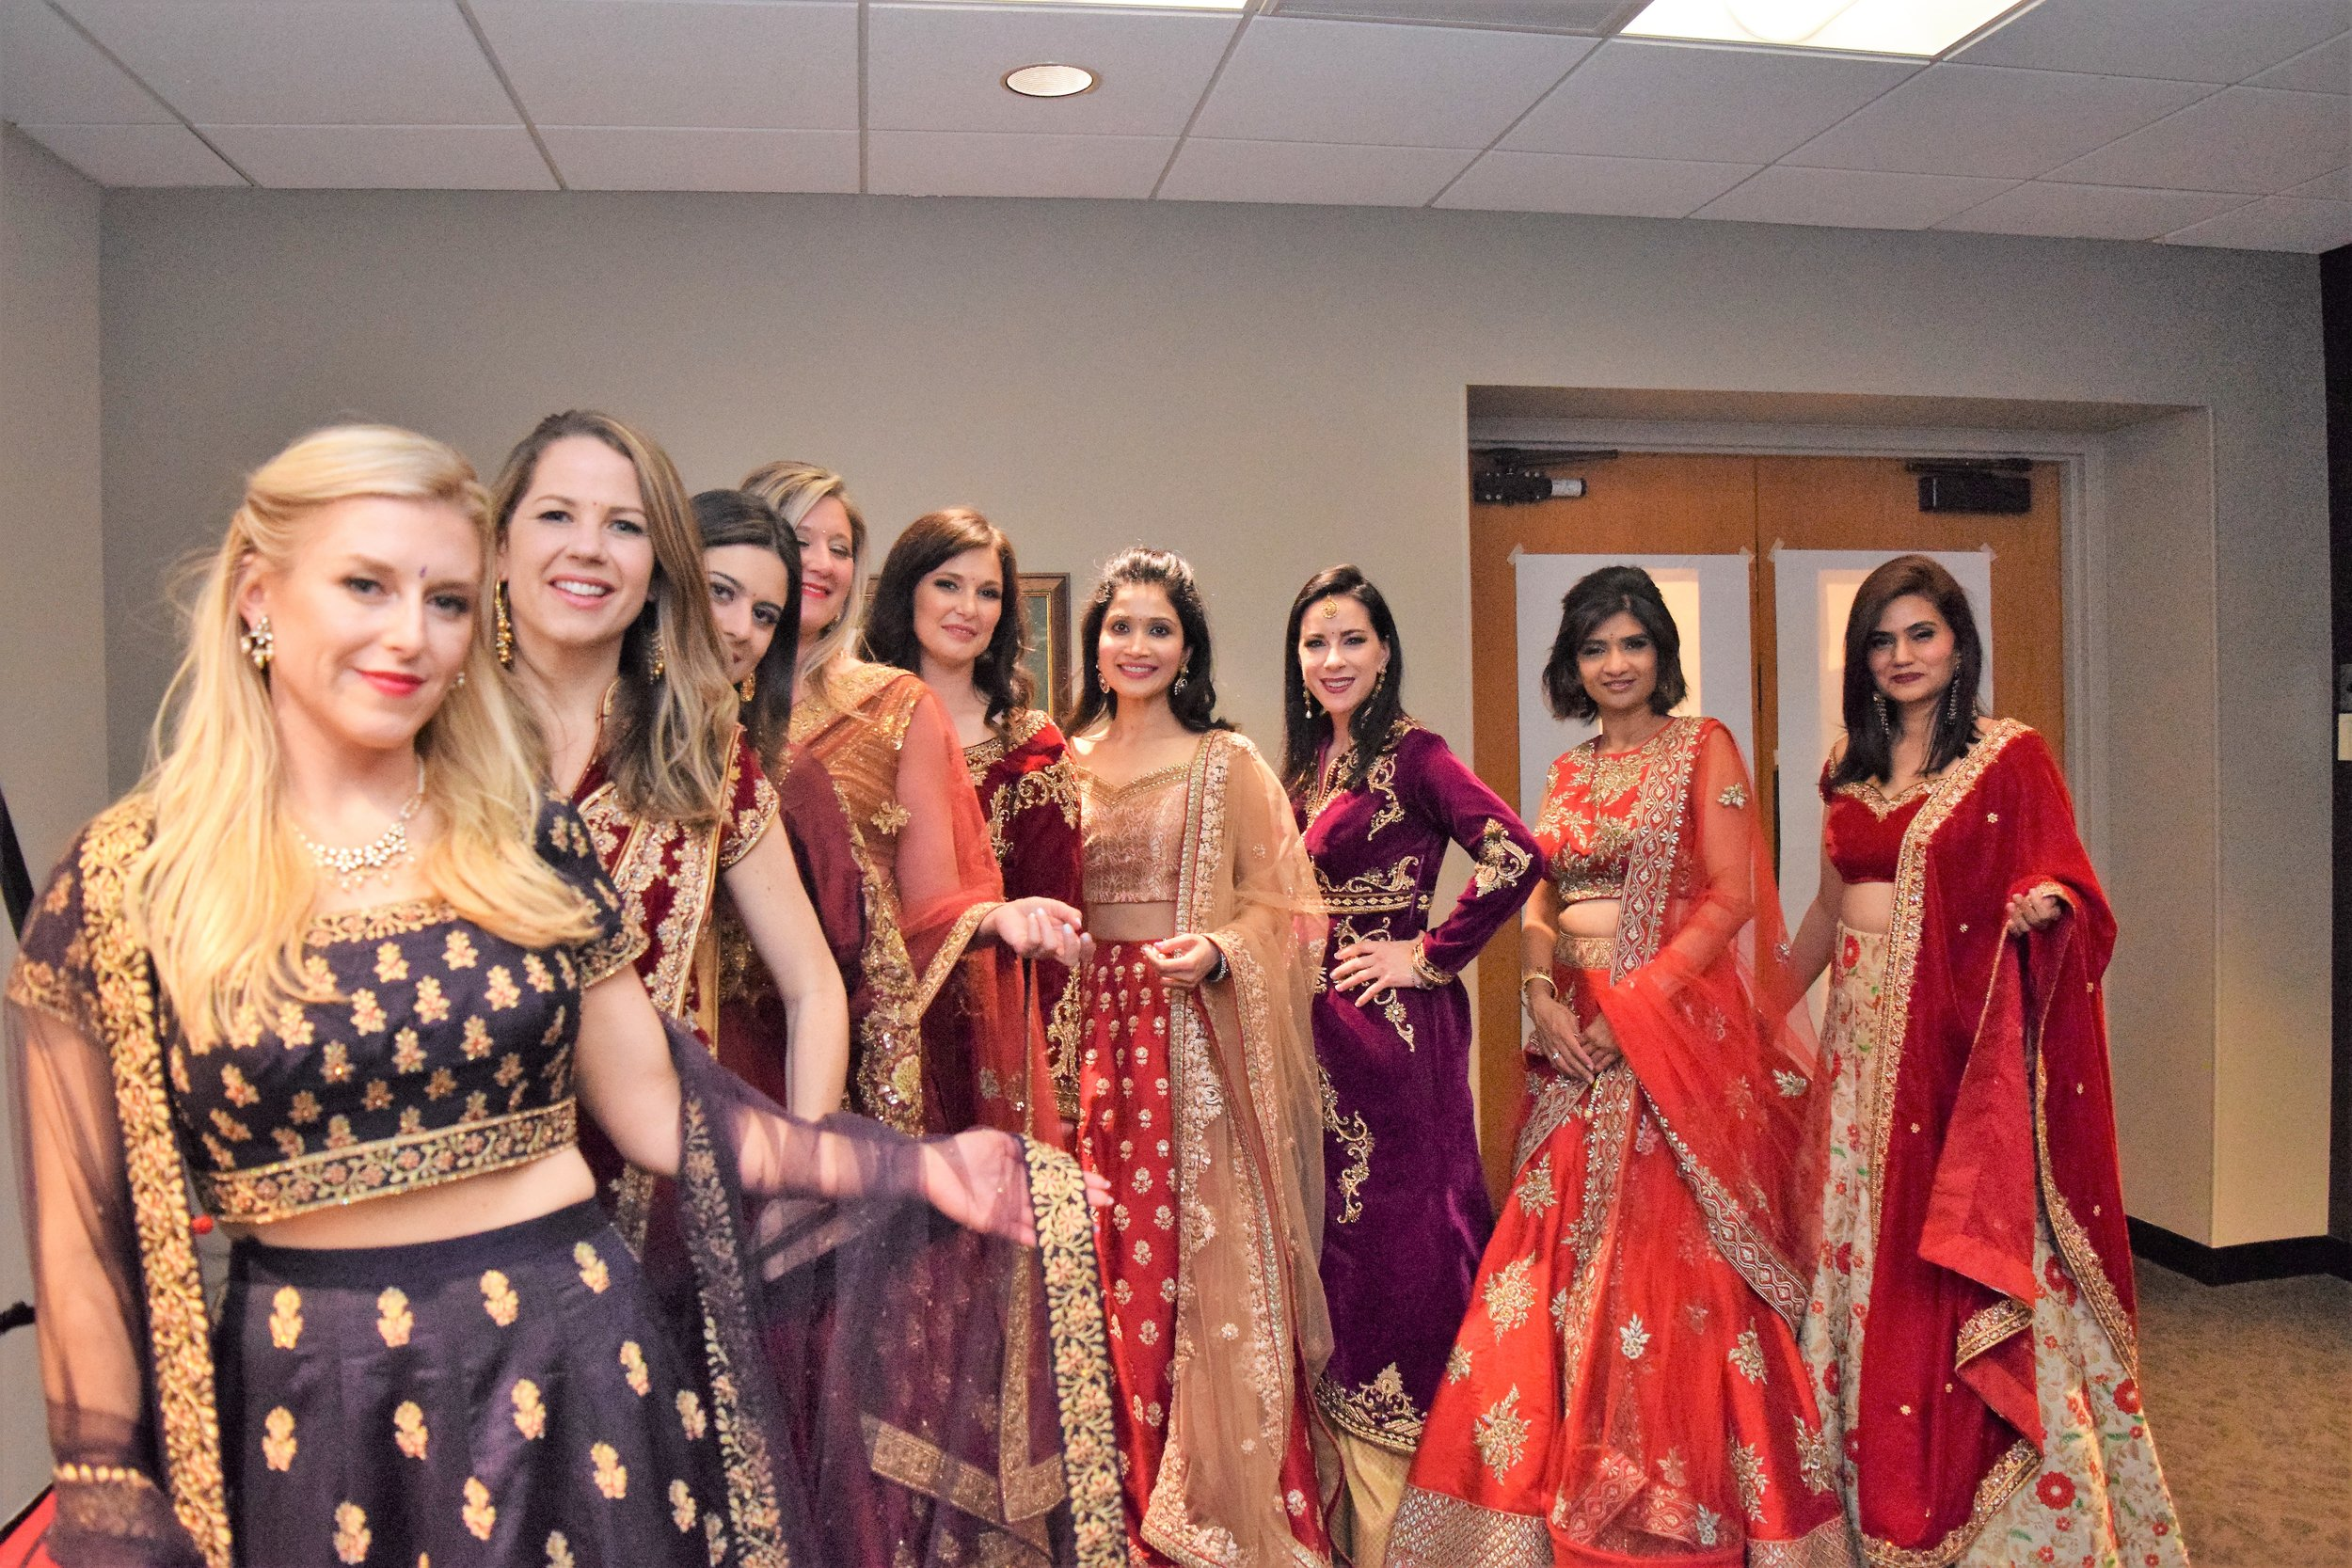 Our EMBA executives... Our Beautiful Fashion Models... L to R: Heather Murray, Brittany Hizer, Fabi Limena Coleoni, Julie Daugherty, Elspeth Moffatt, Dr. Sonam Chouksey, Alison Bullock, Rohini Hebbar, Inder Kaur